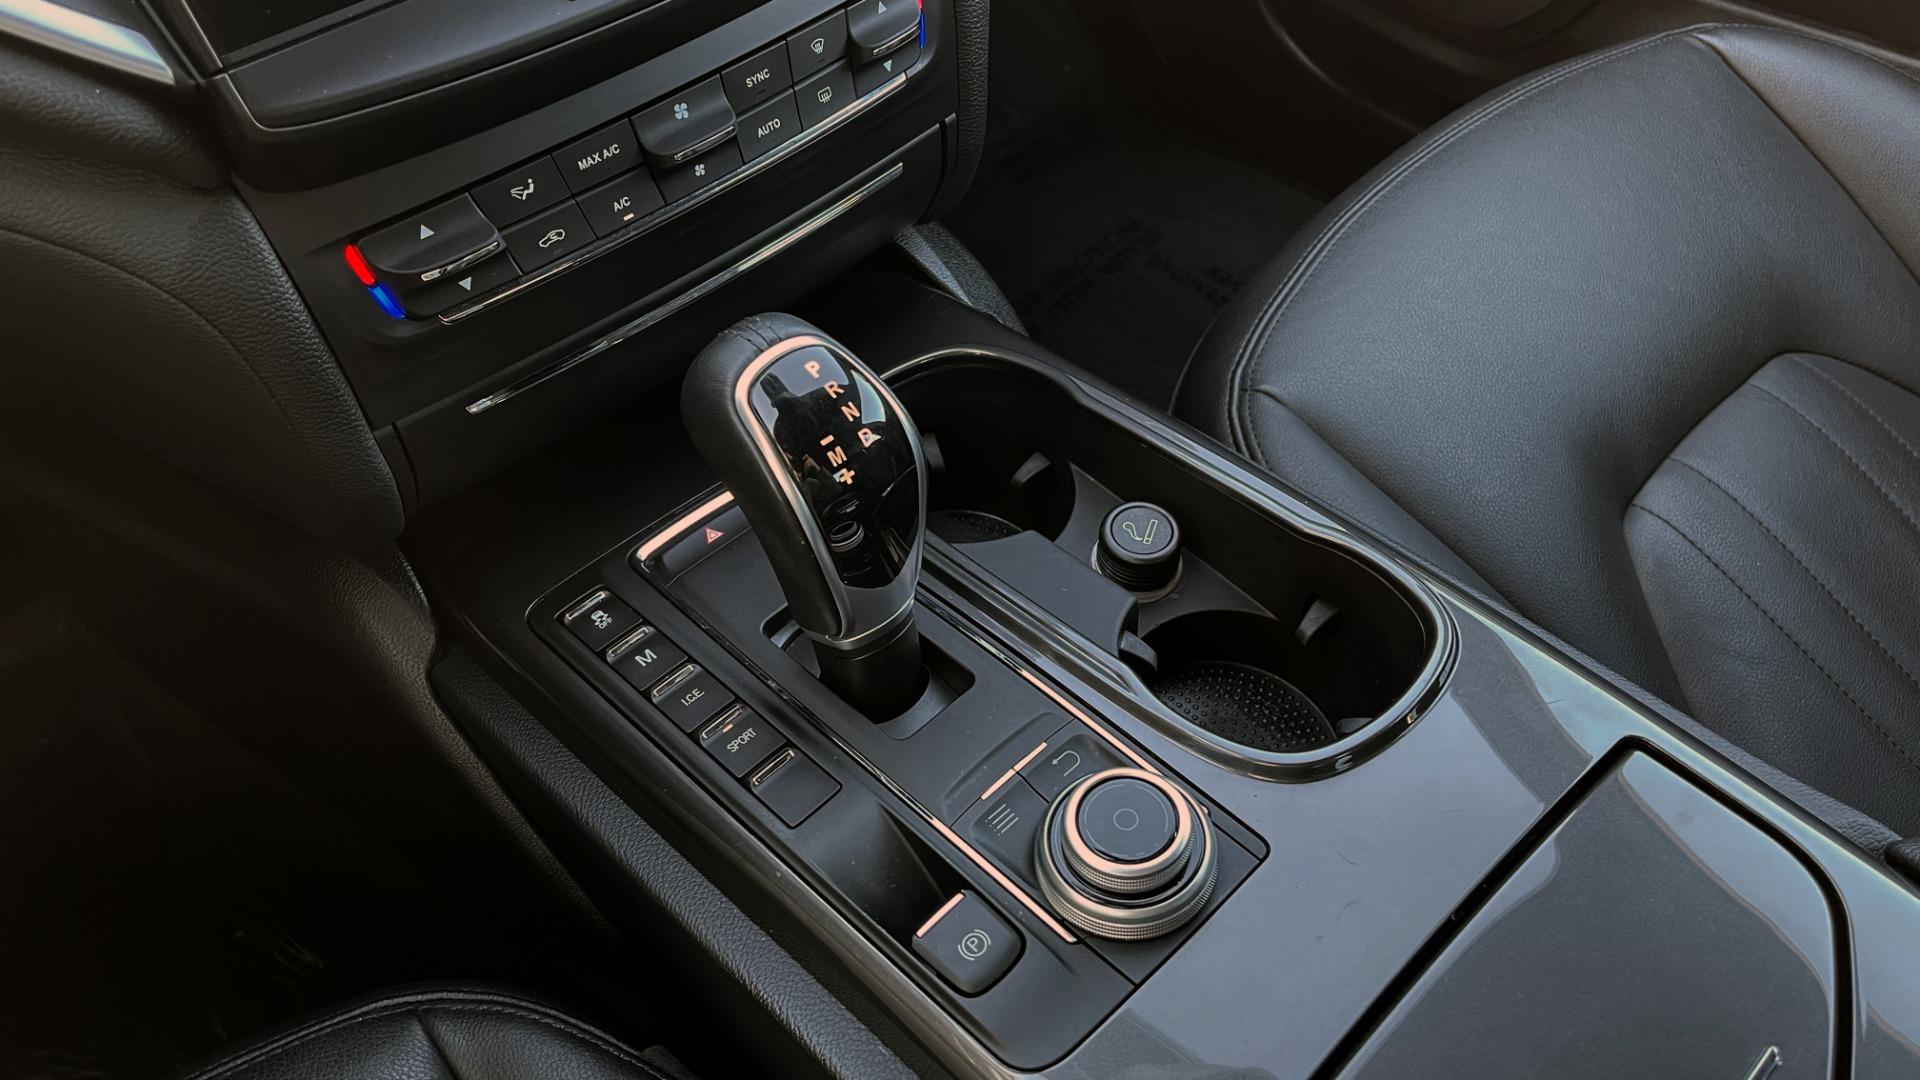 Used 2018 Maserati GHIBLI SEDAN / RWD / 3.0L V6 / SUNROOF / NAV / REARVIEW for sale $42,995 at Formula Imports in Charlotte NC 28227 44